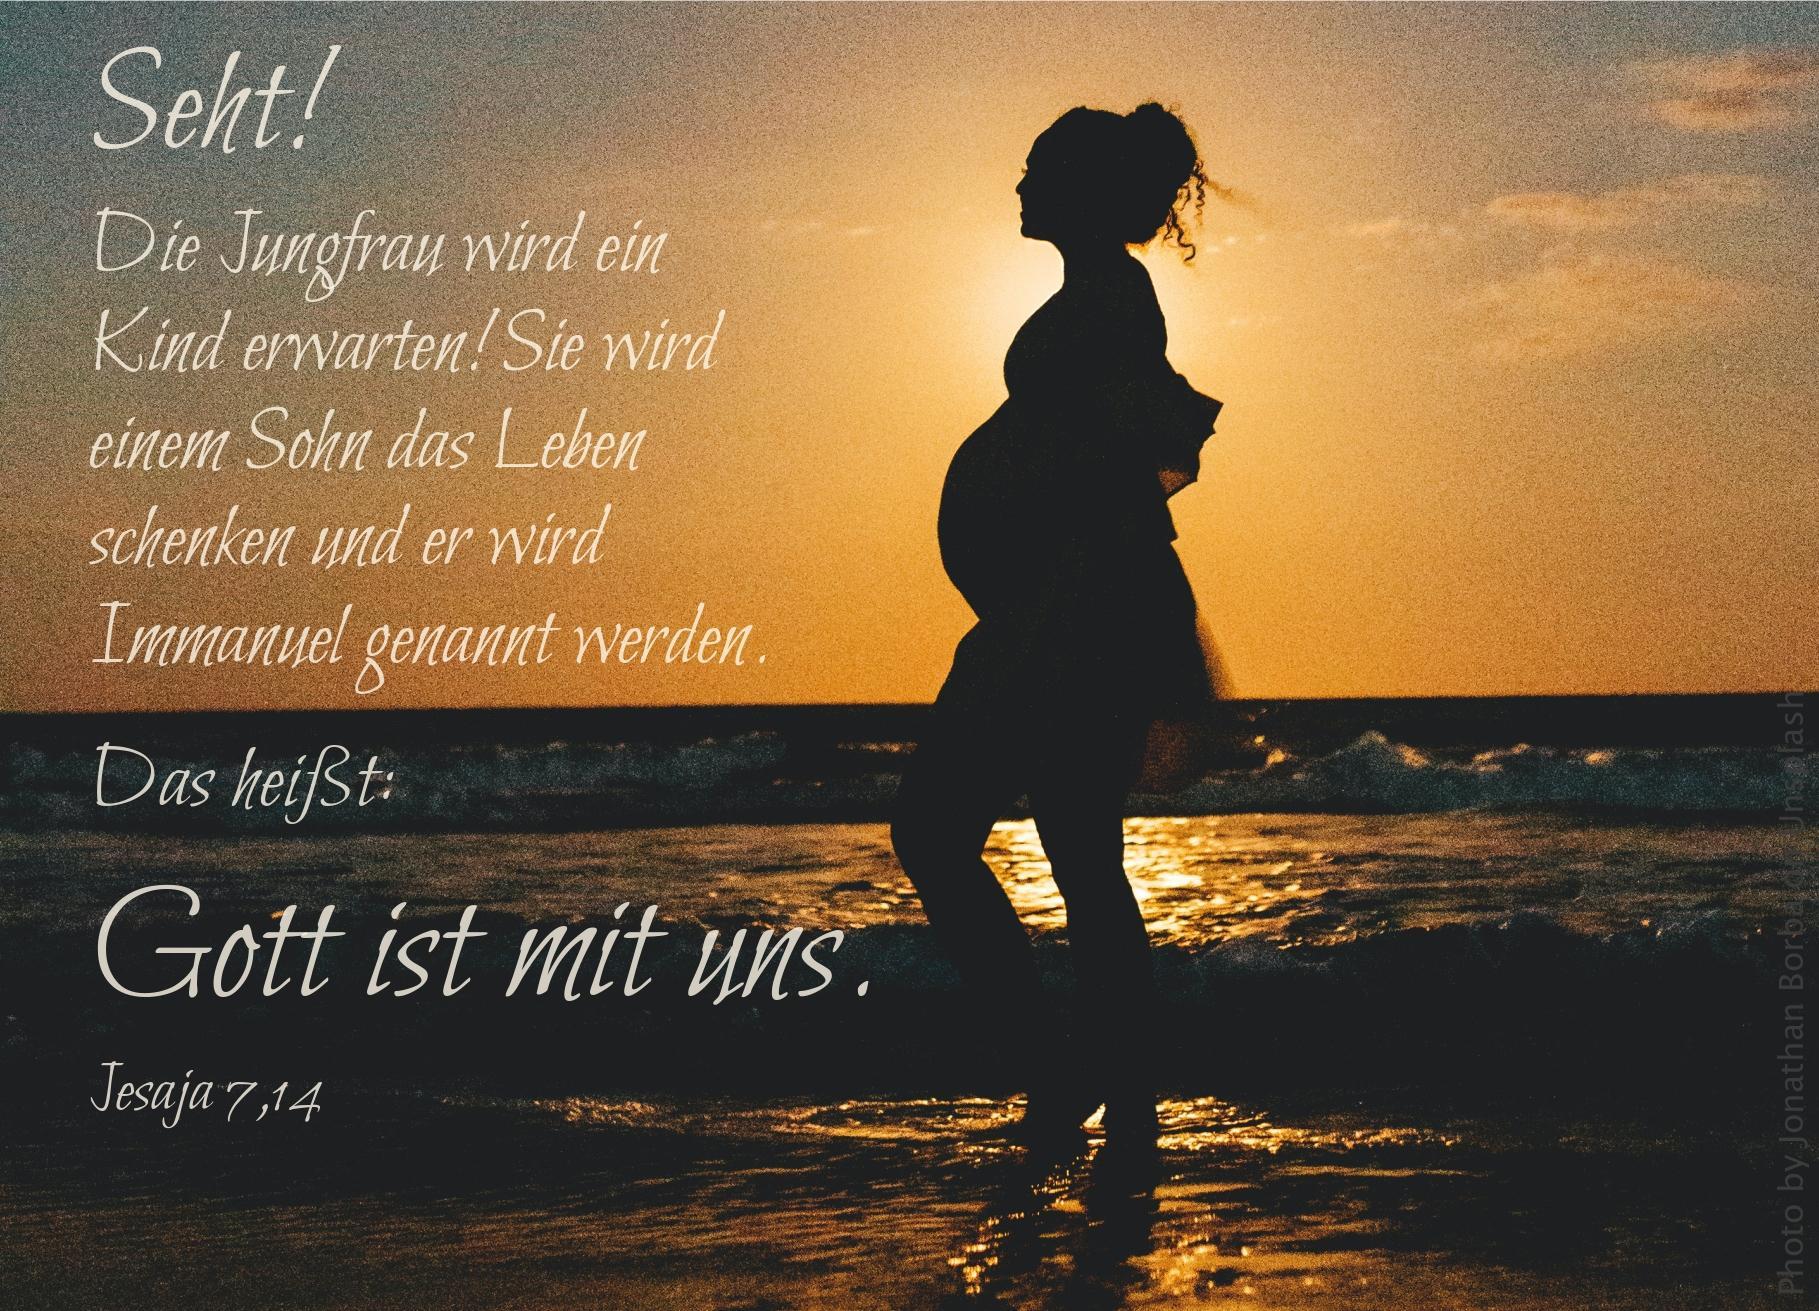 "alt=""schwangere_frau_am_meer_erwartet_bibelhoerbuch_jesajas_berufung"""